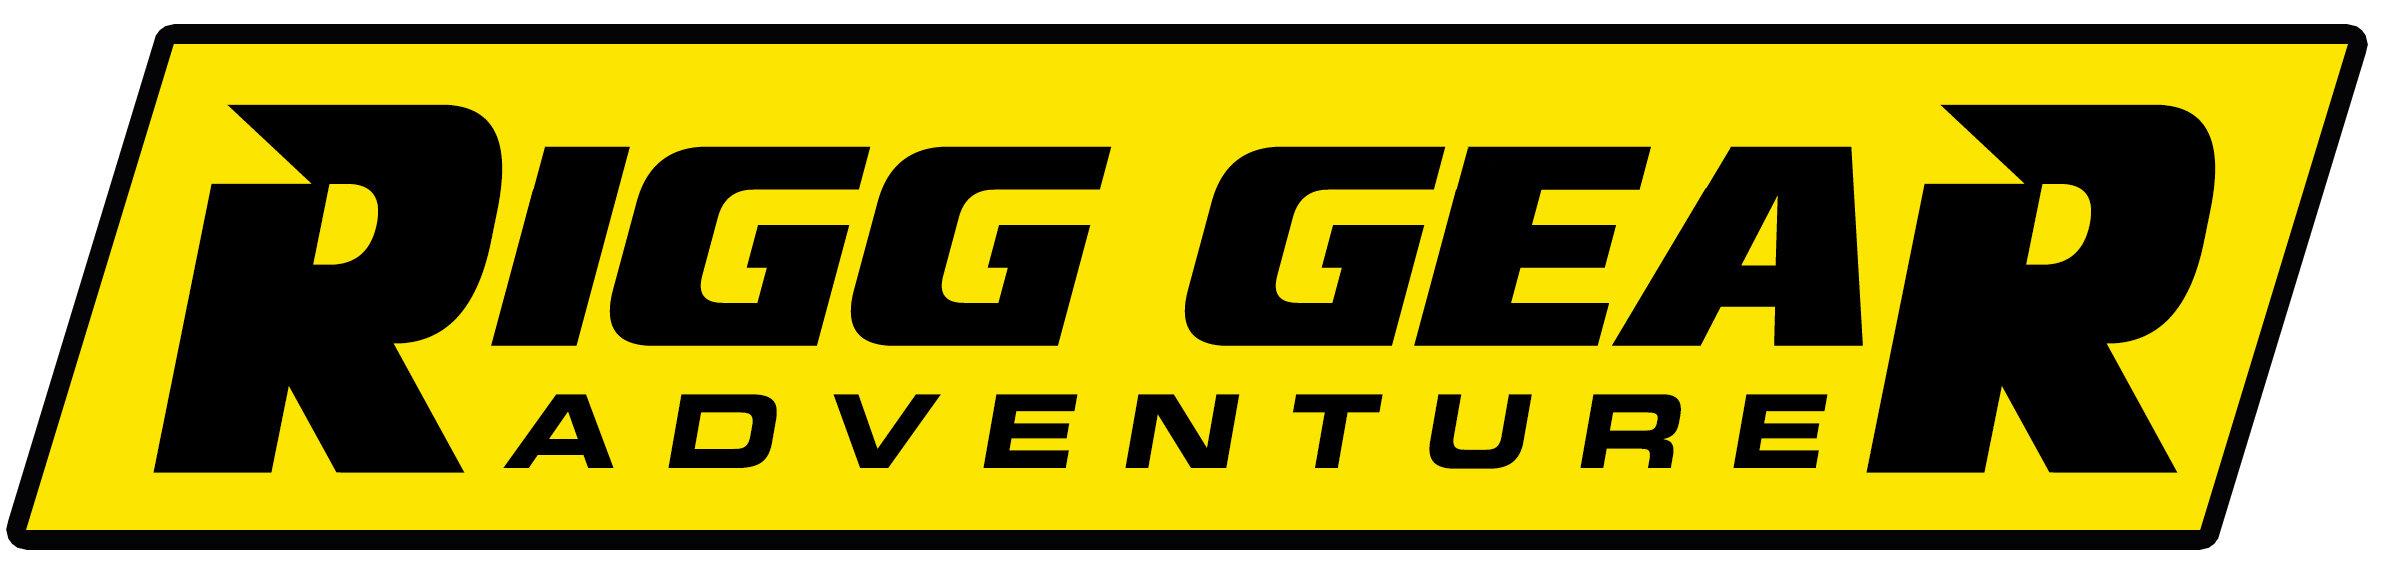 Rigg Gear Logo.jpg